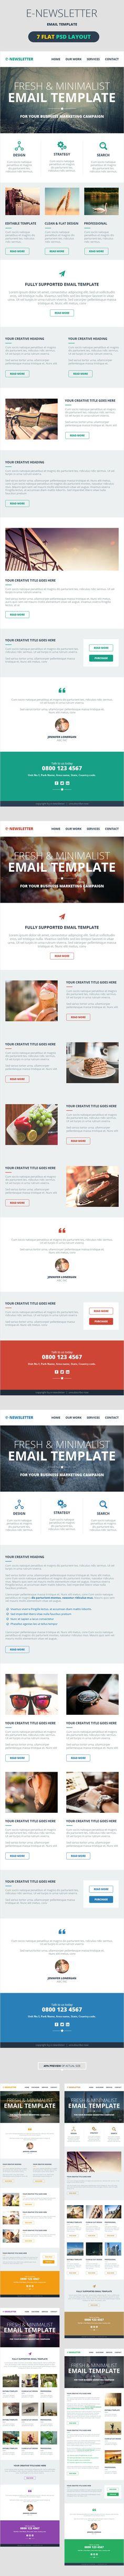 Multipurpose E-Newsletter Email Template by webduck webduck, via Behance